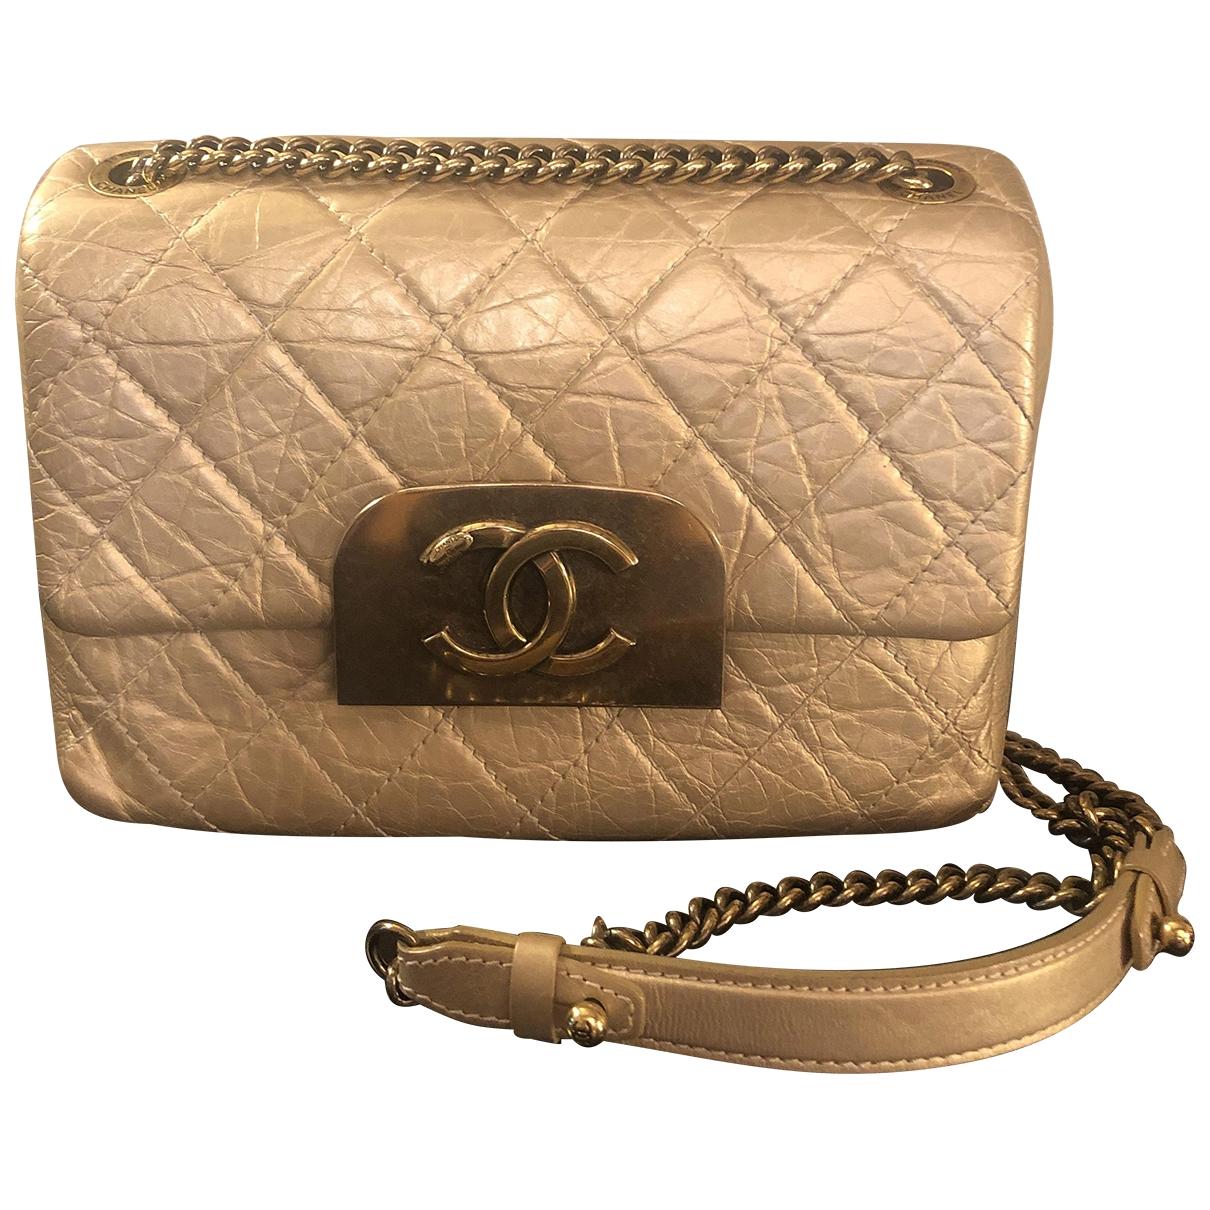 Chanel - Sac a main   pour femme en cuir - dore